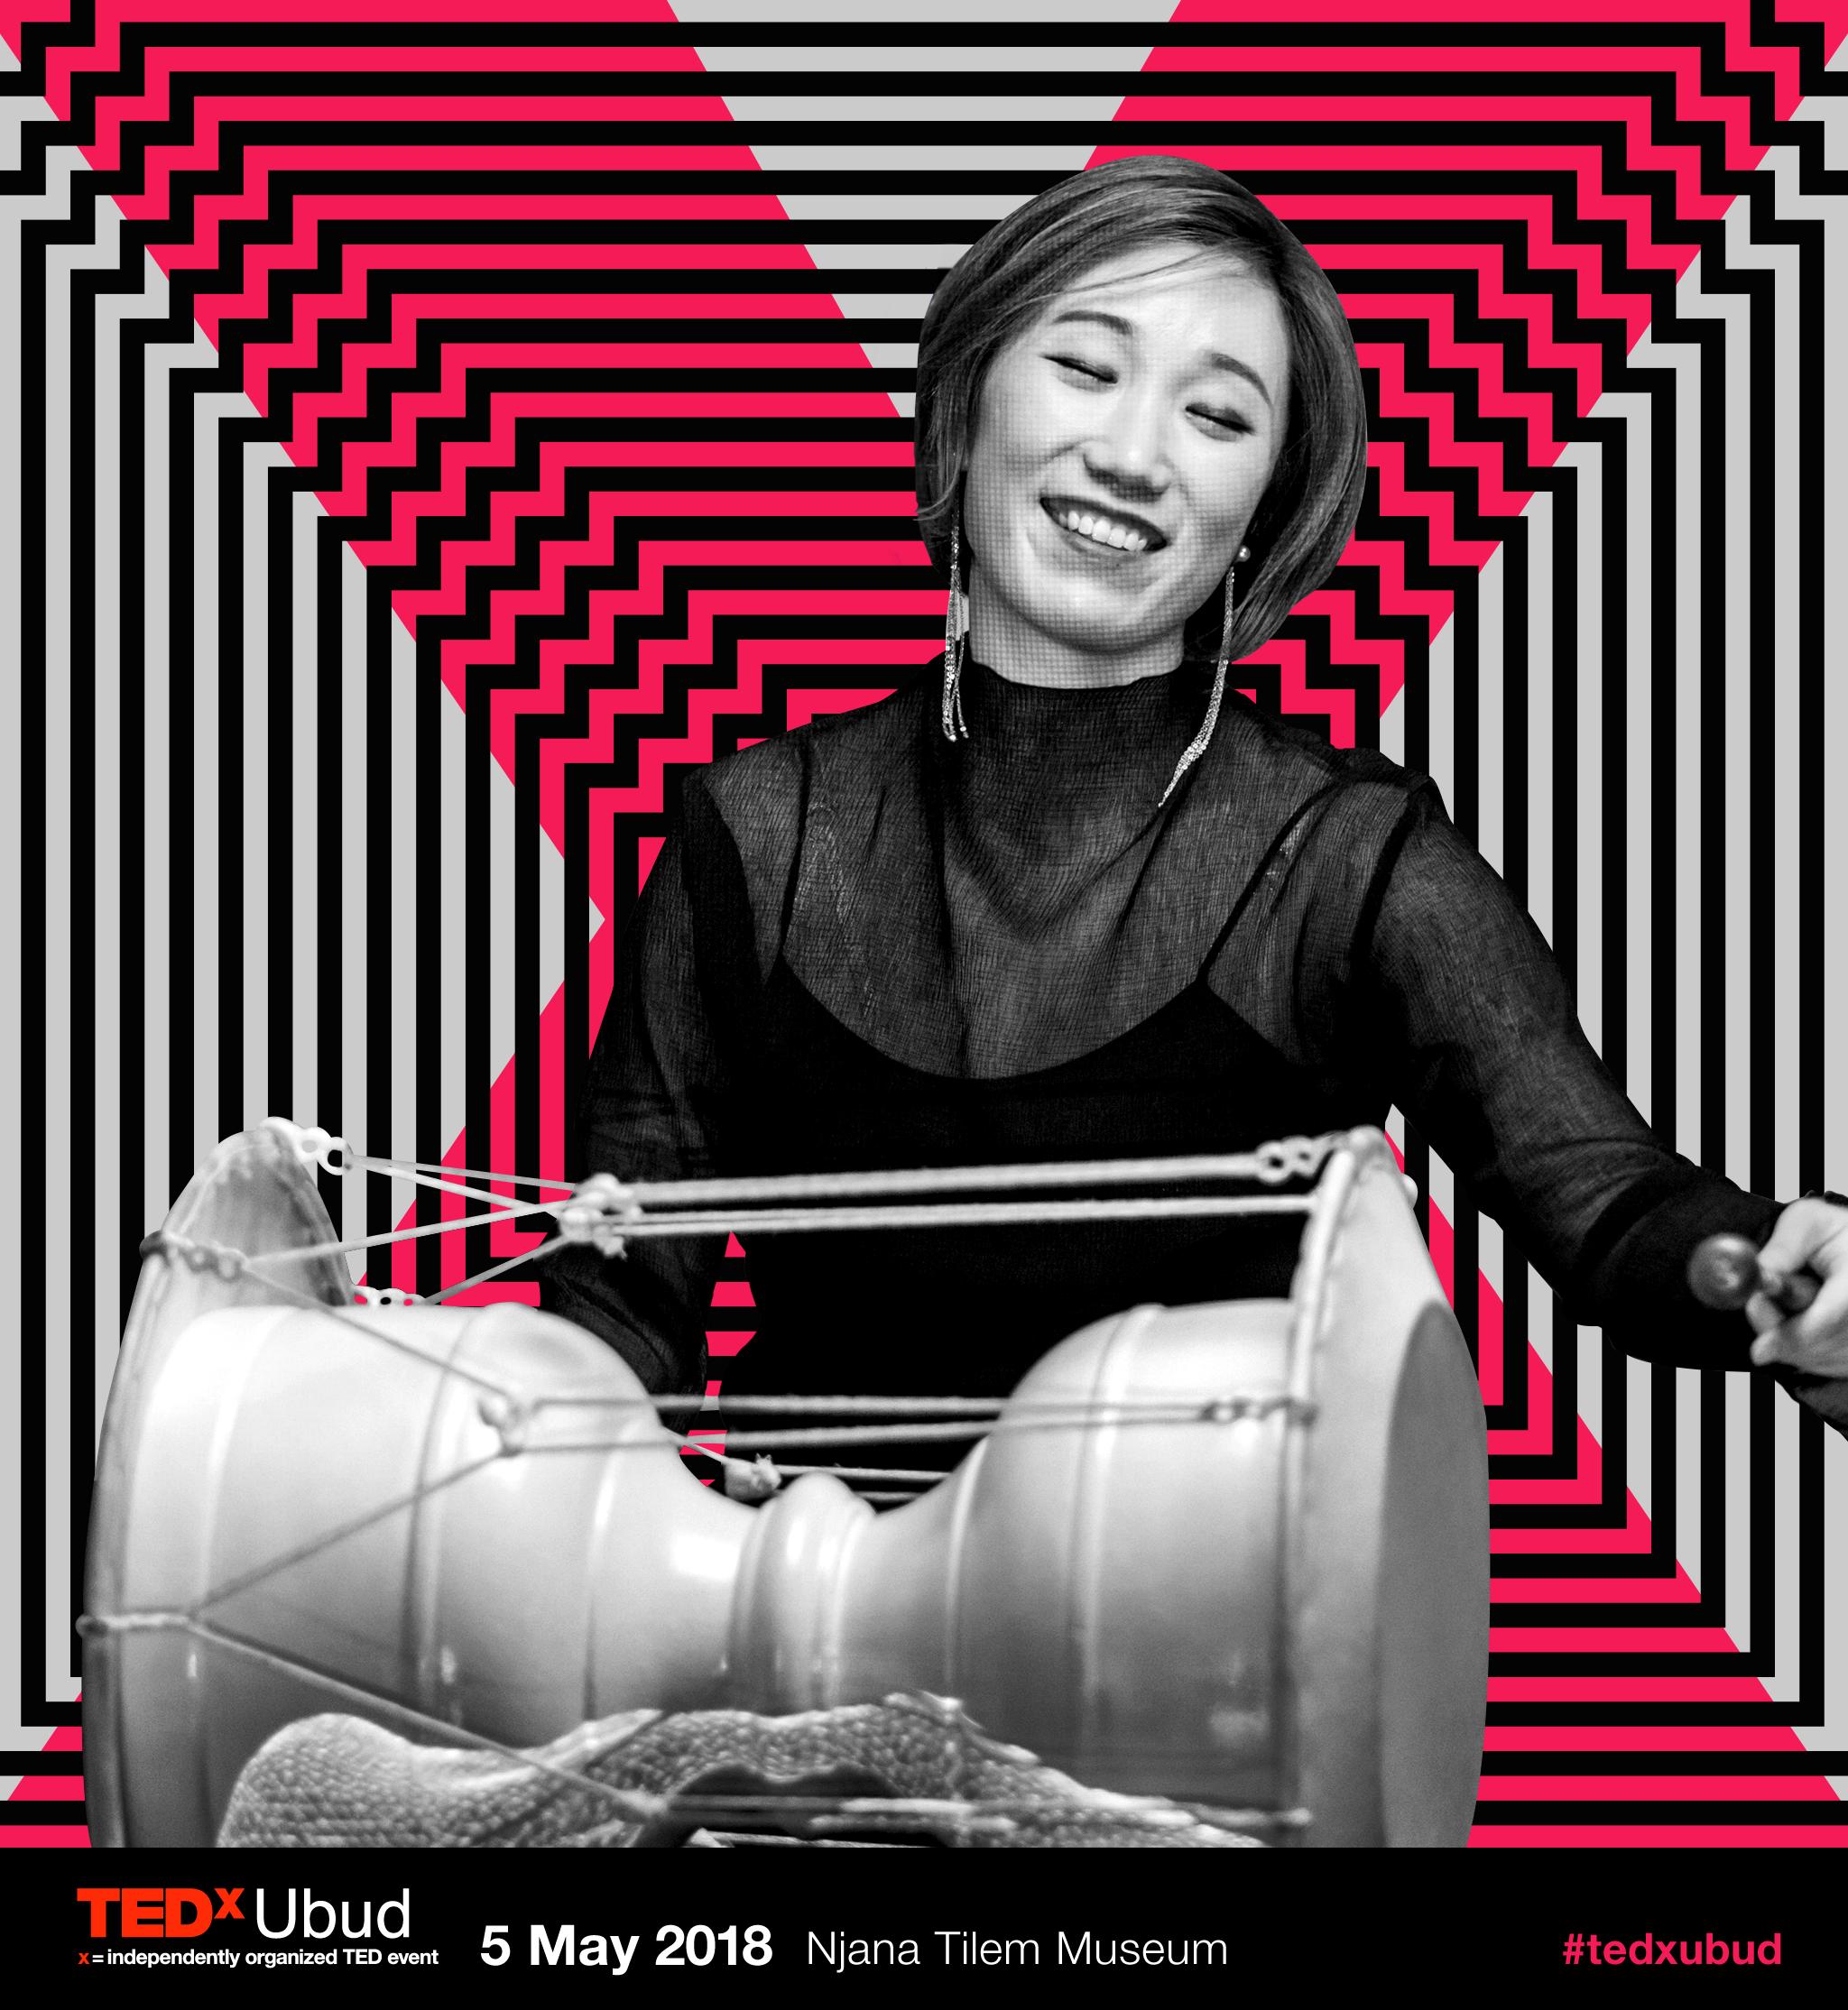 2018-KimSoRa TEDxUbud-FB.png